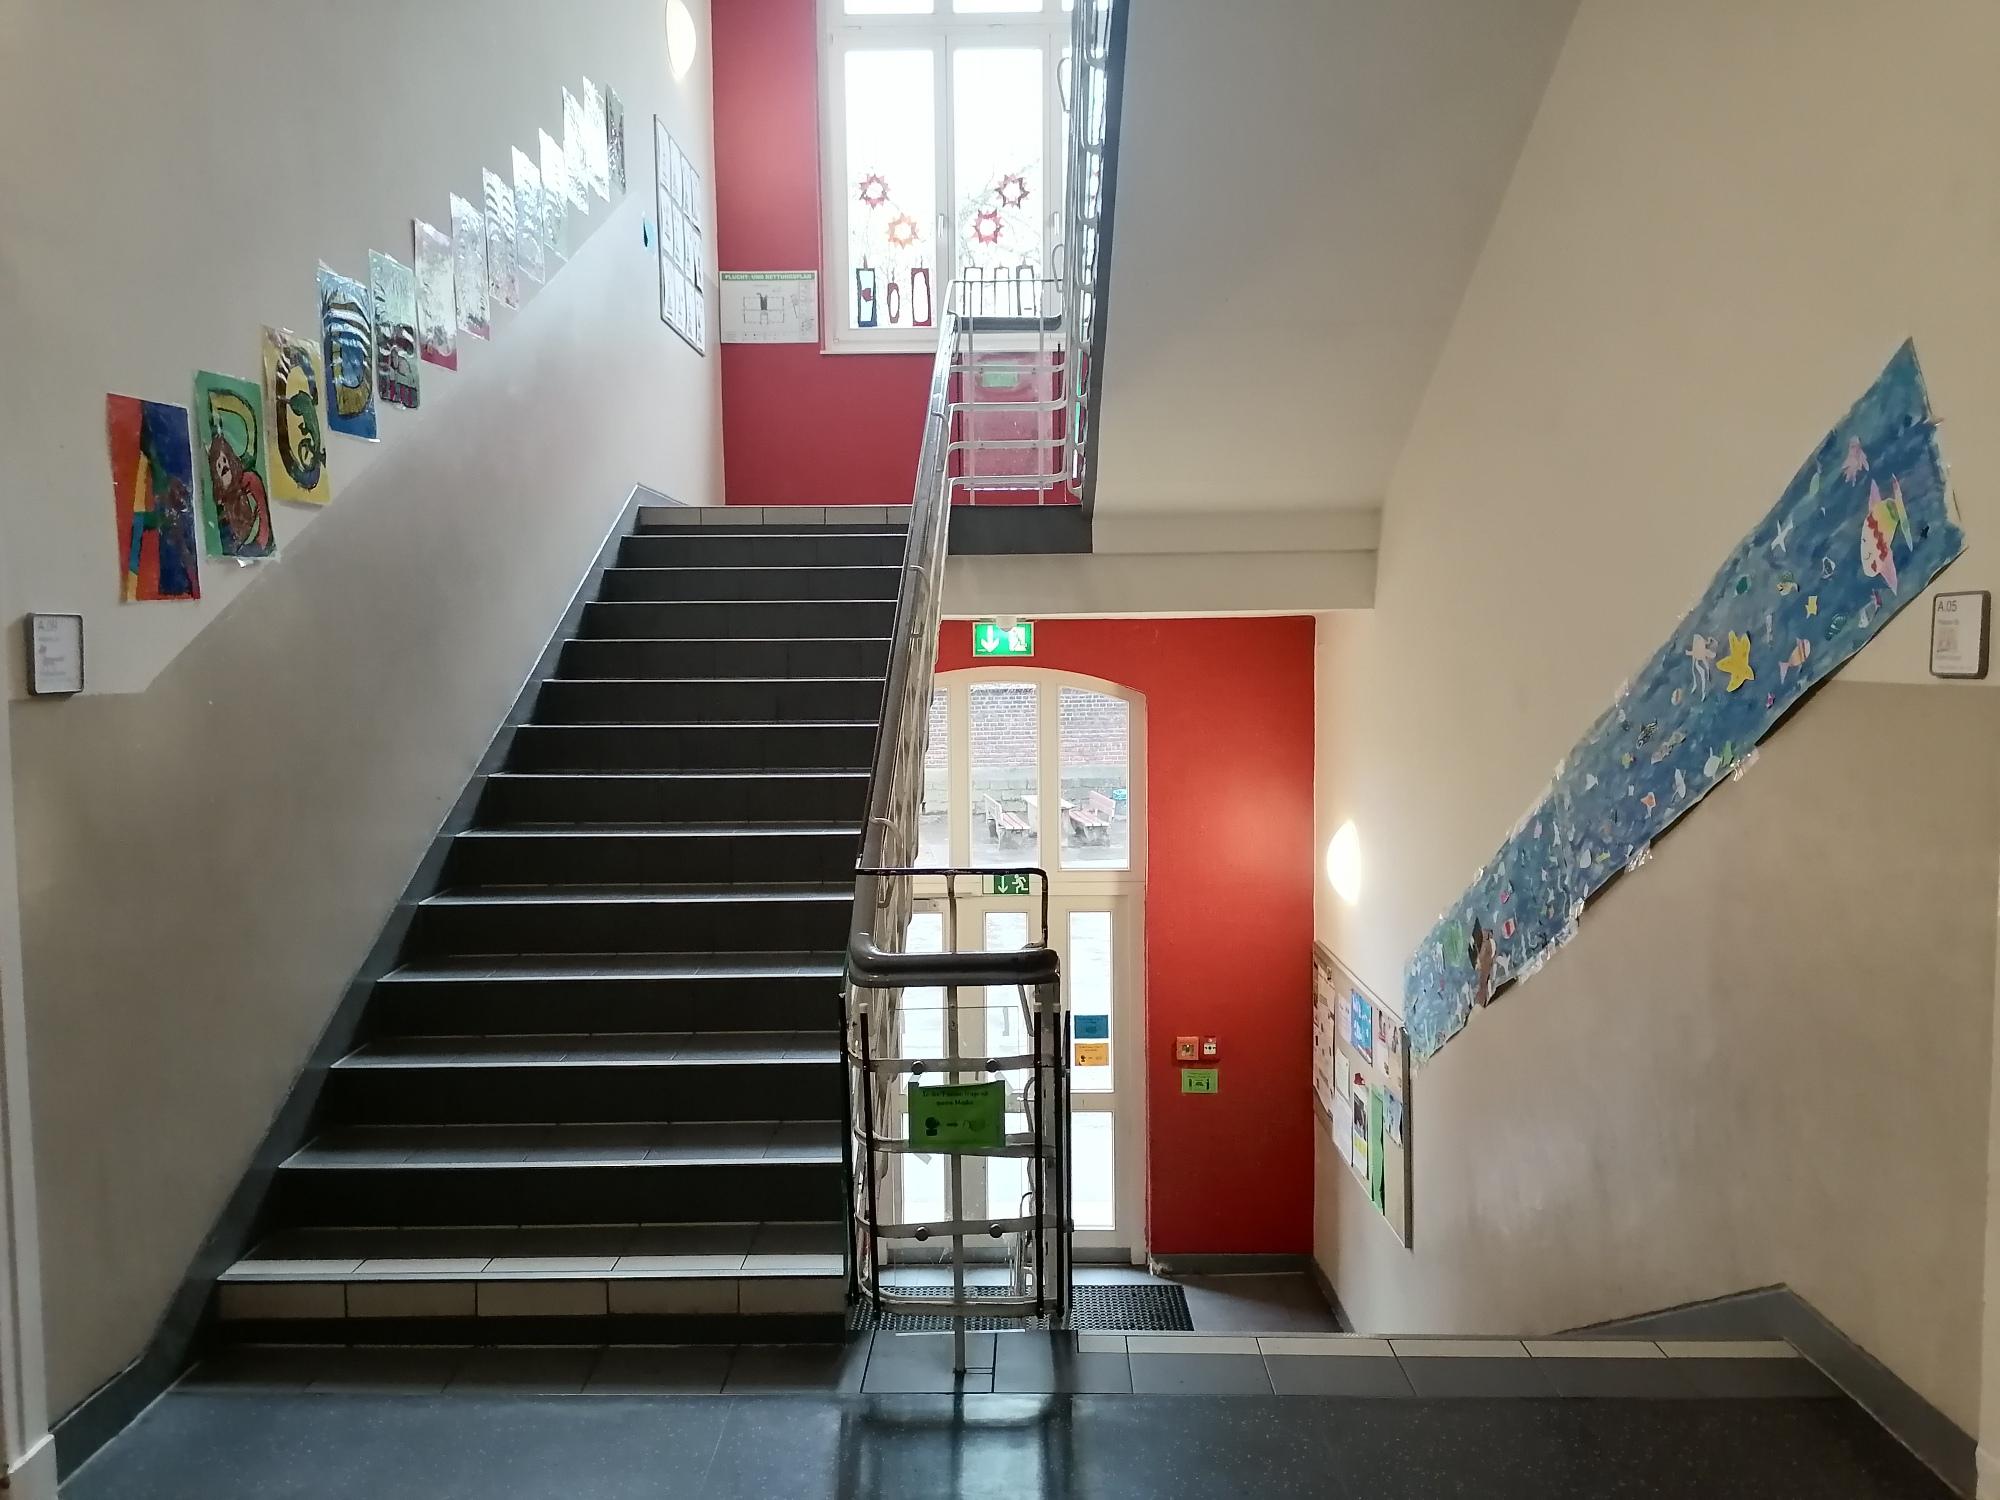 Treppenhaus Altbau 1. Etage Ausgang Schulhof